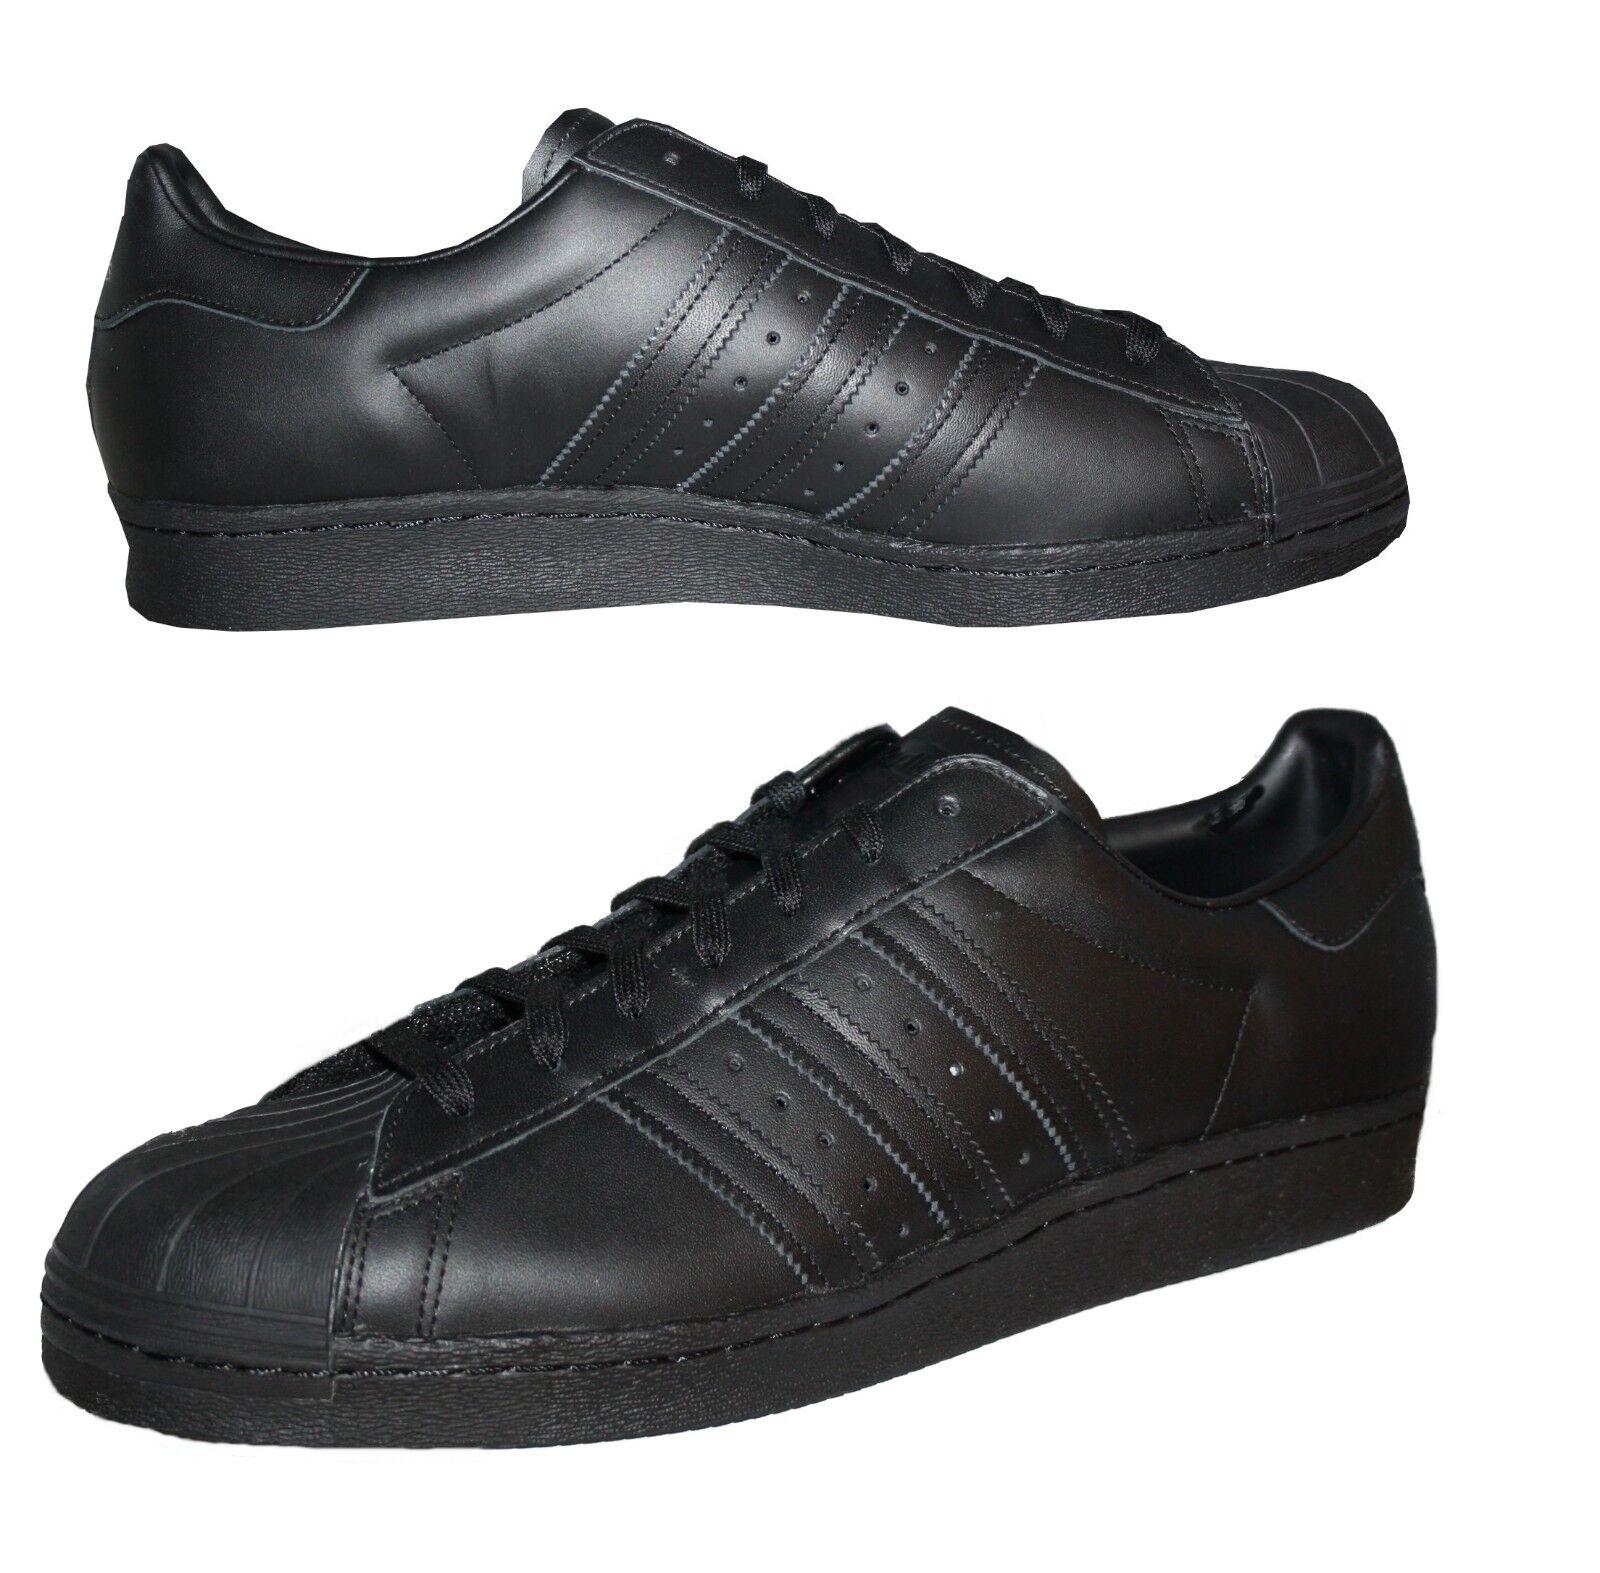 Adidas Superstar 80s Herren Retro Sneaker Schuhe Leder schwarz Gr. 49 1/3